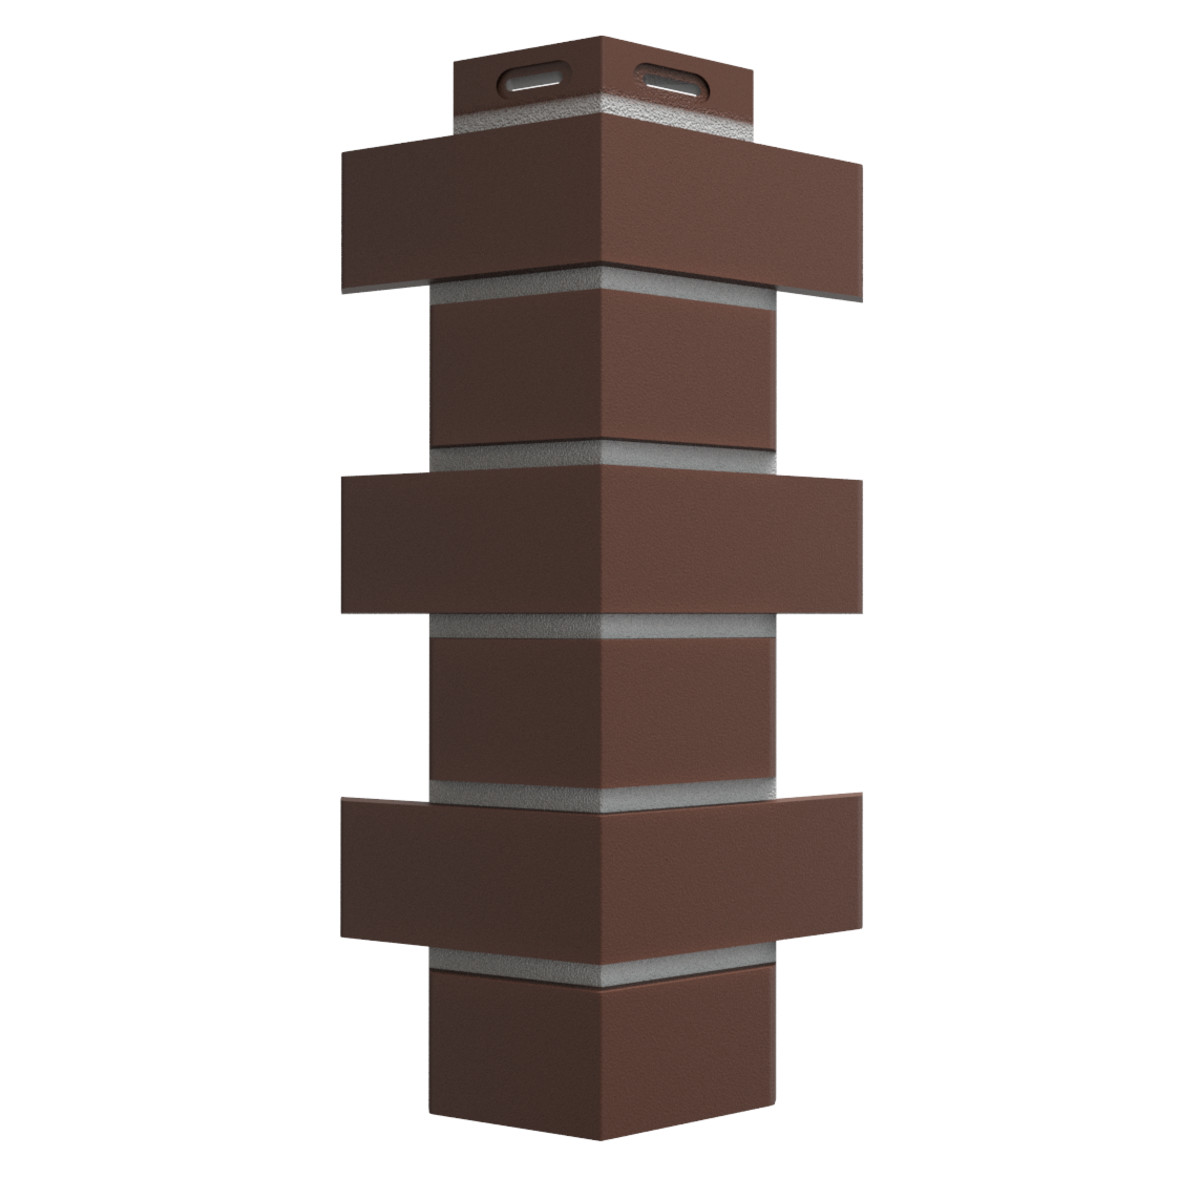 Угол наружный Dacha Кирпич гладкий цвет темно-коричневый